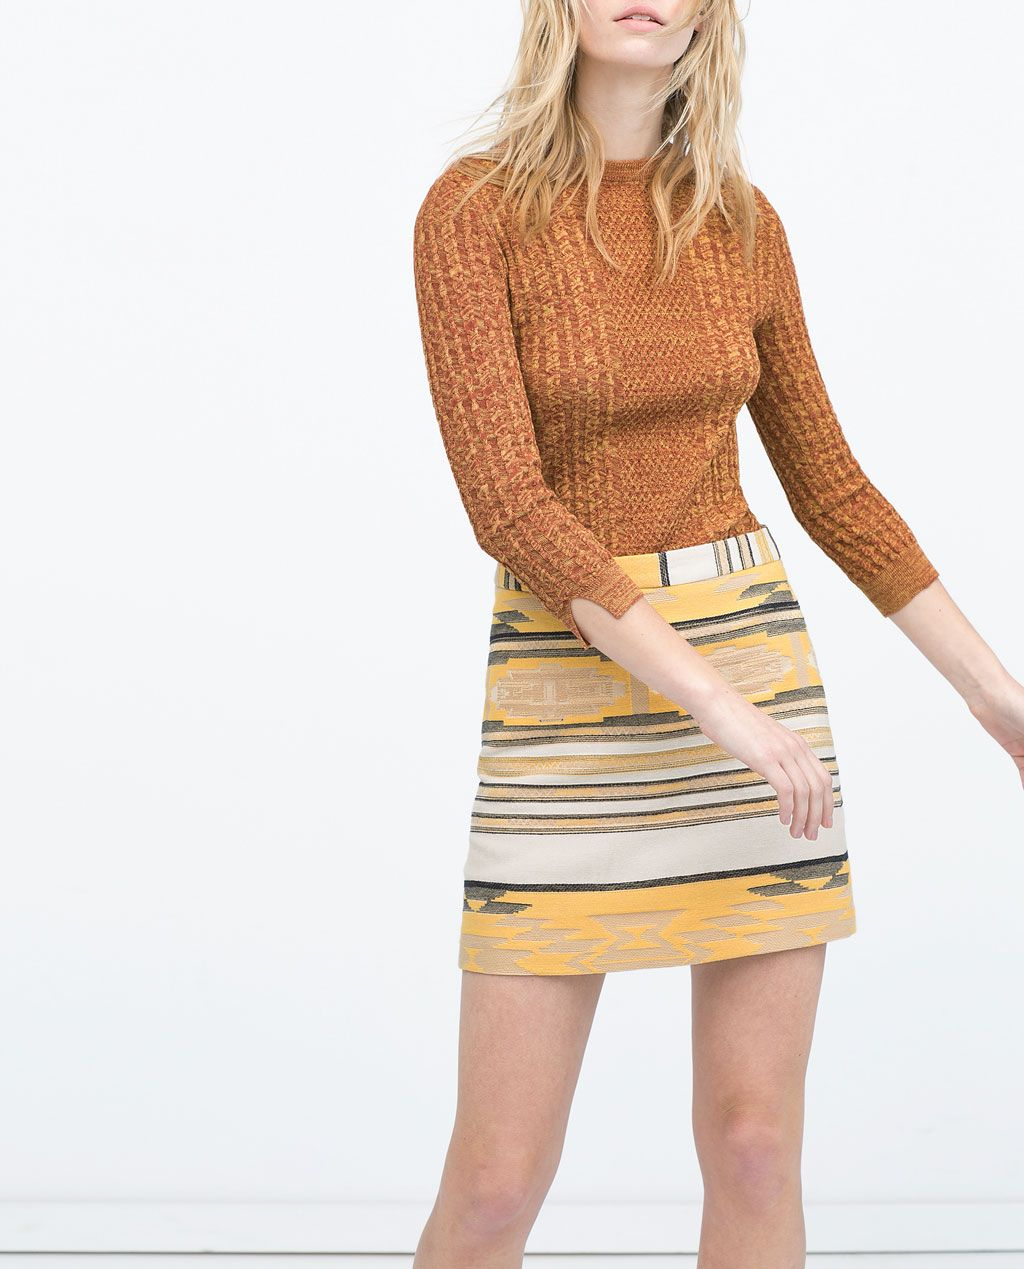 94c718886 Imagen 1 de FALDA JACQUARD ETNICA de Zara   Estilo. Outfits!   Falda ...